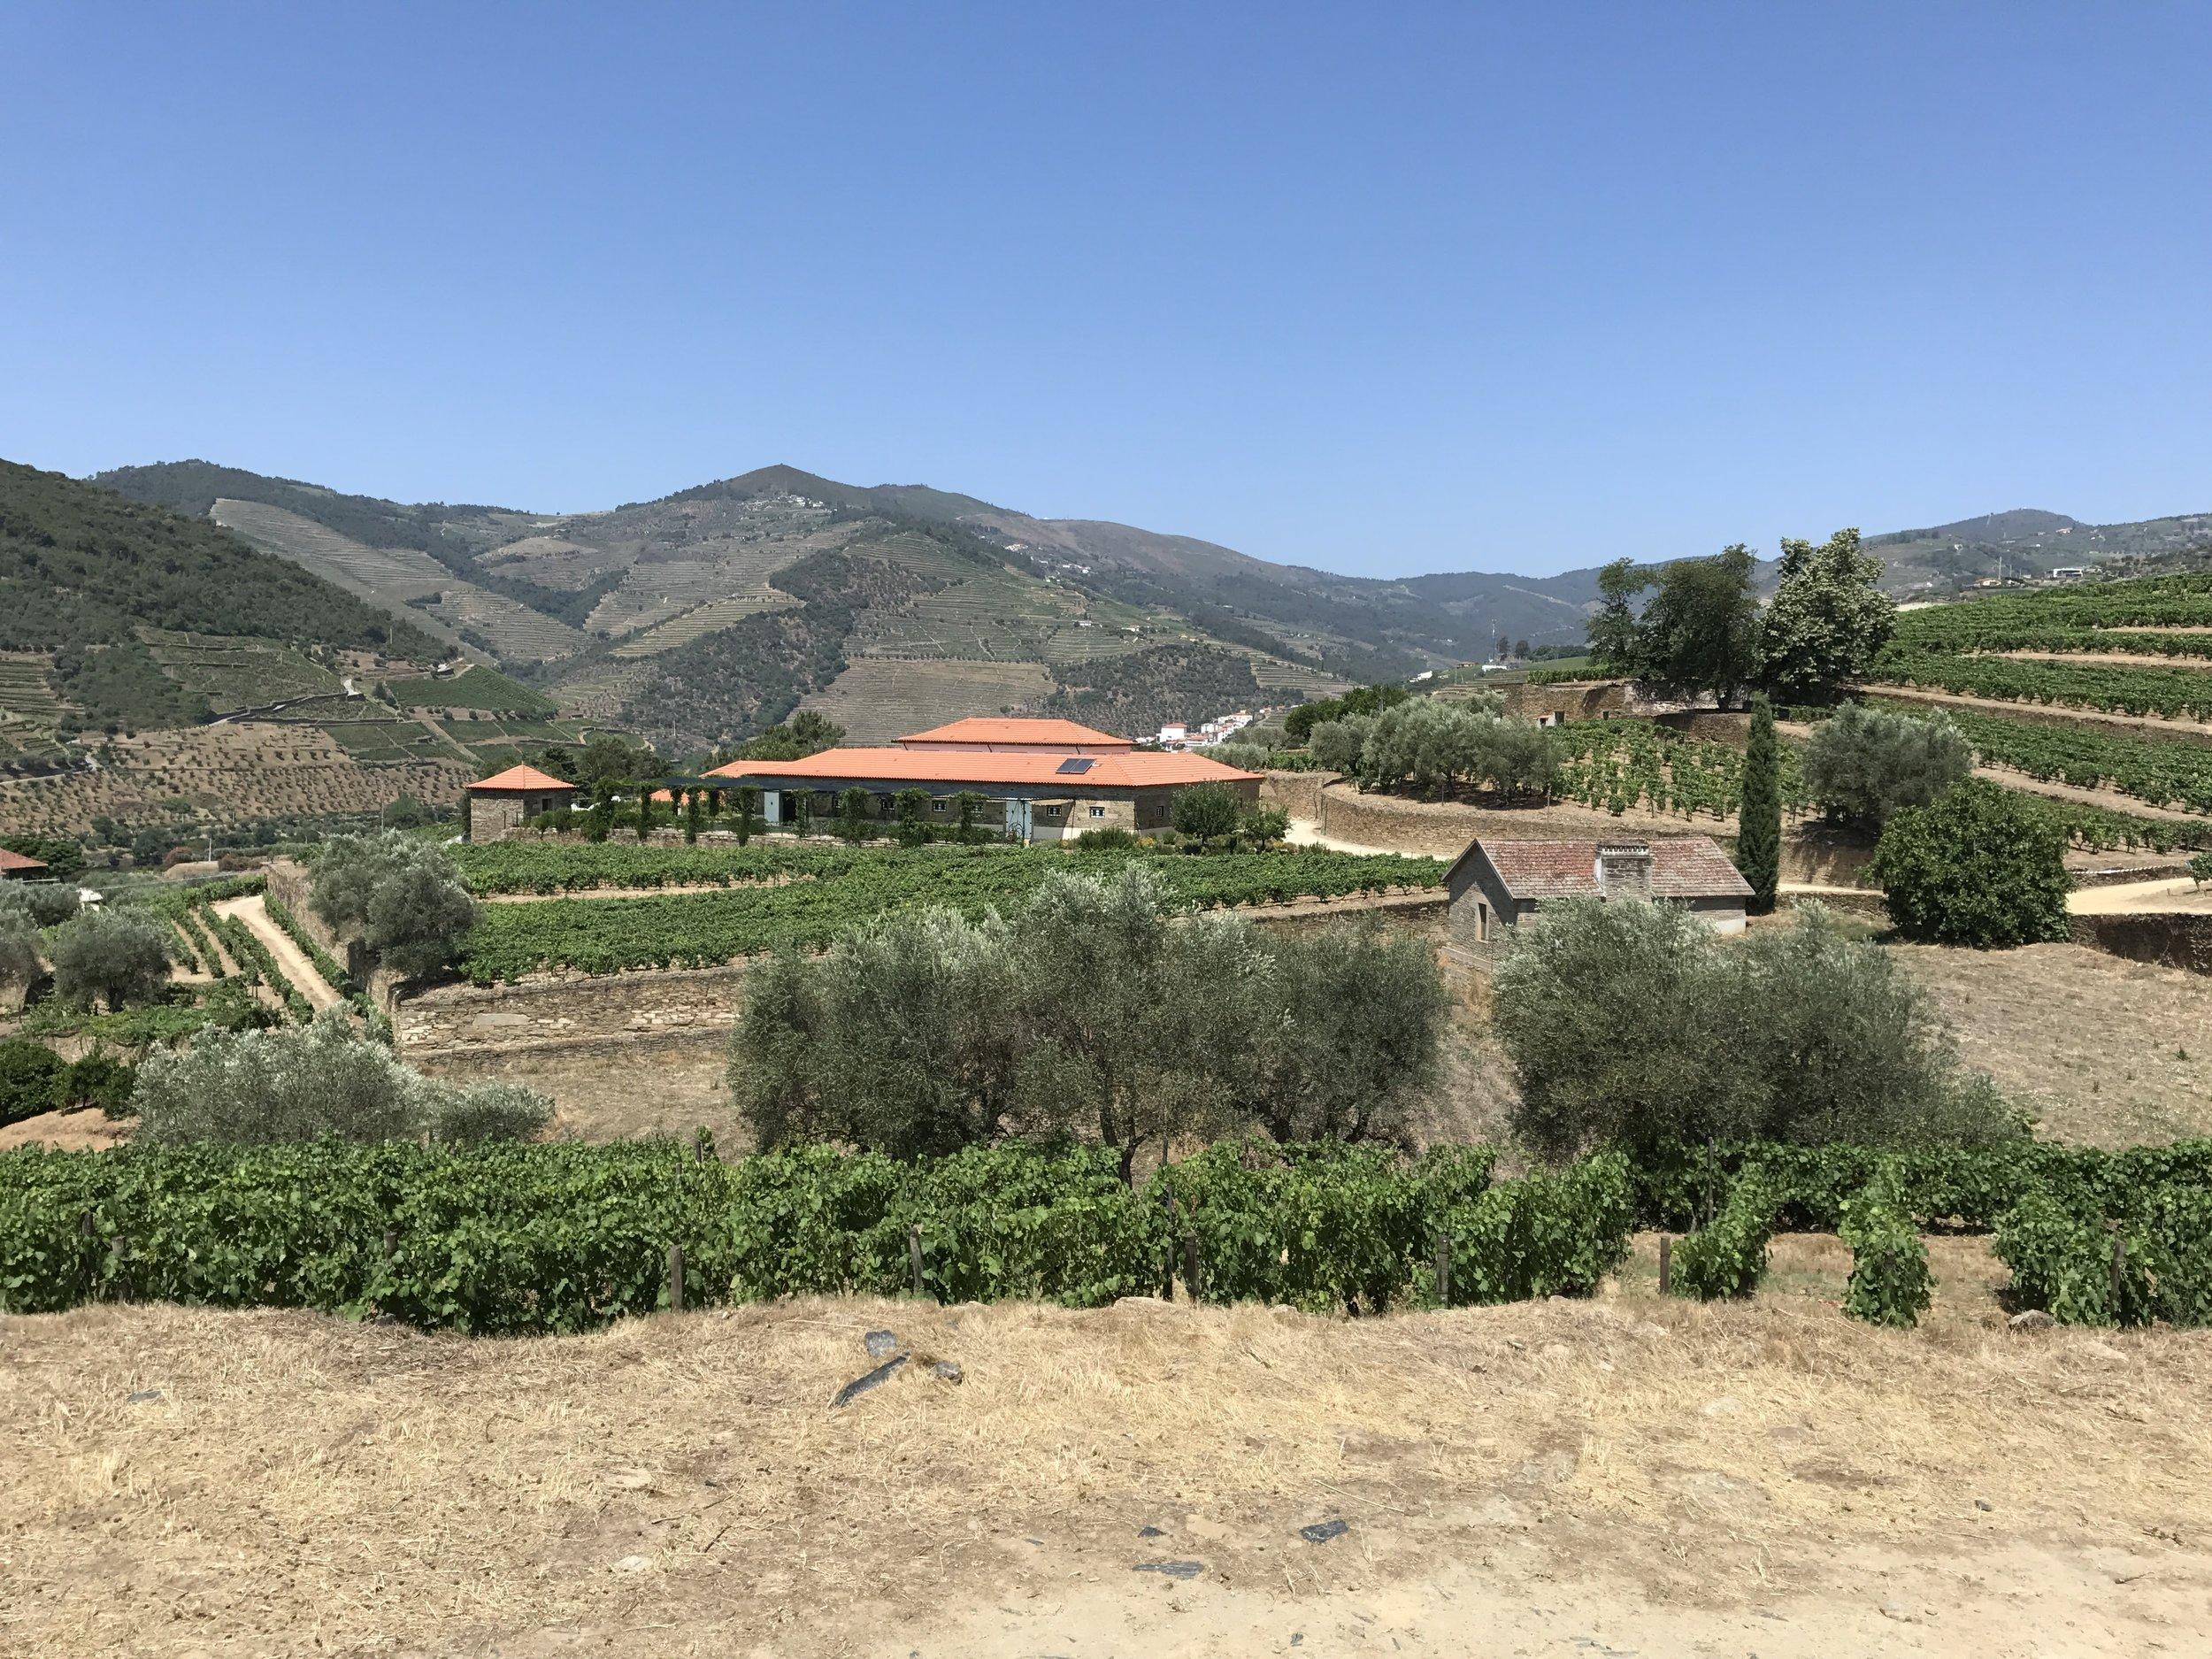 douro valley // microtomacro